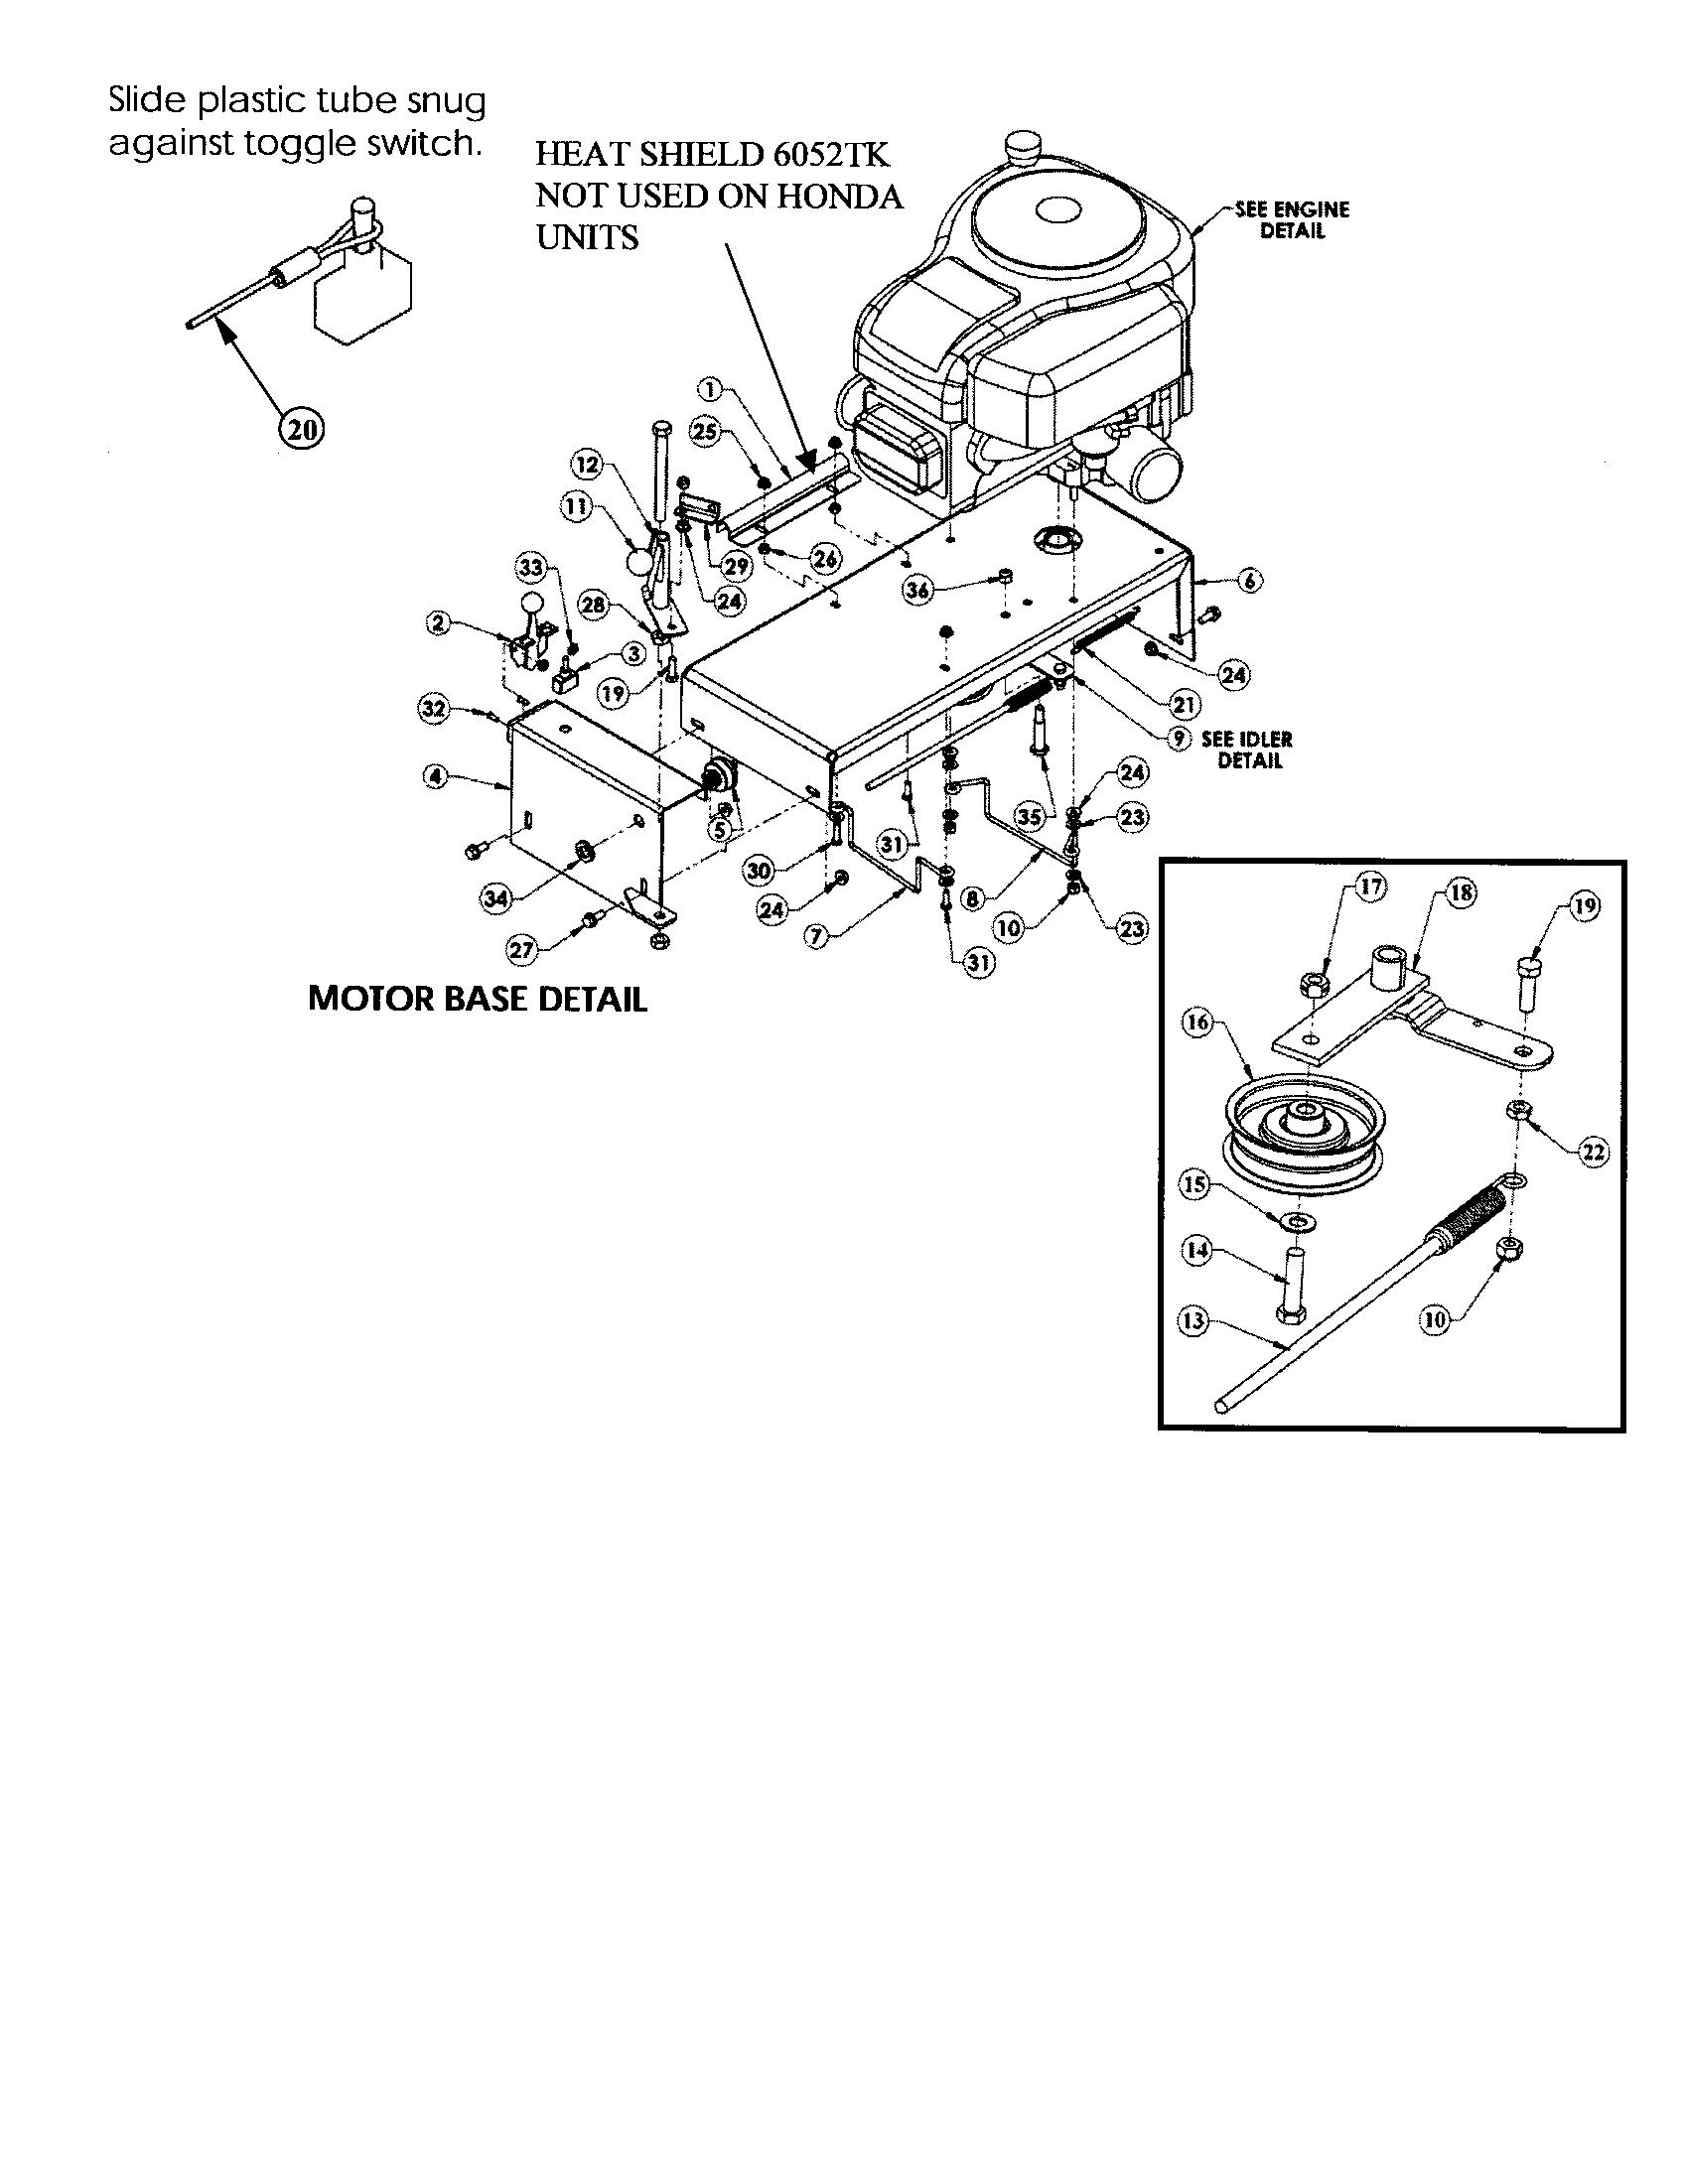 wiring diagram moreover honeywell zone valve wiring diagram further